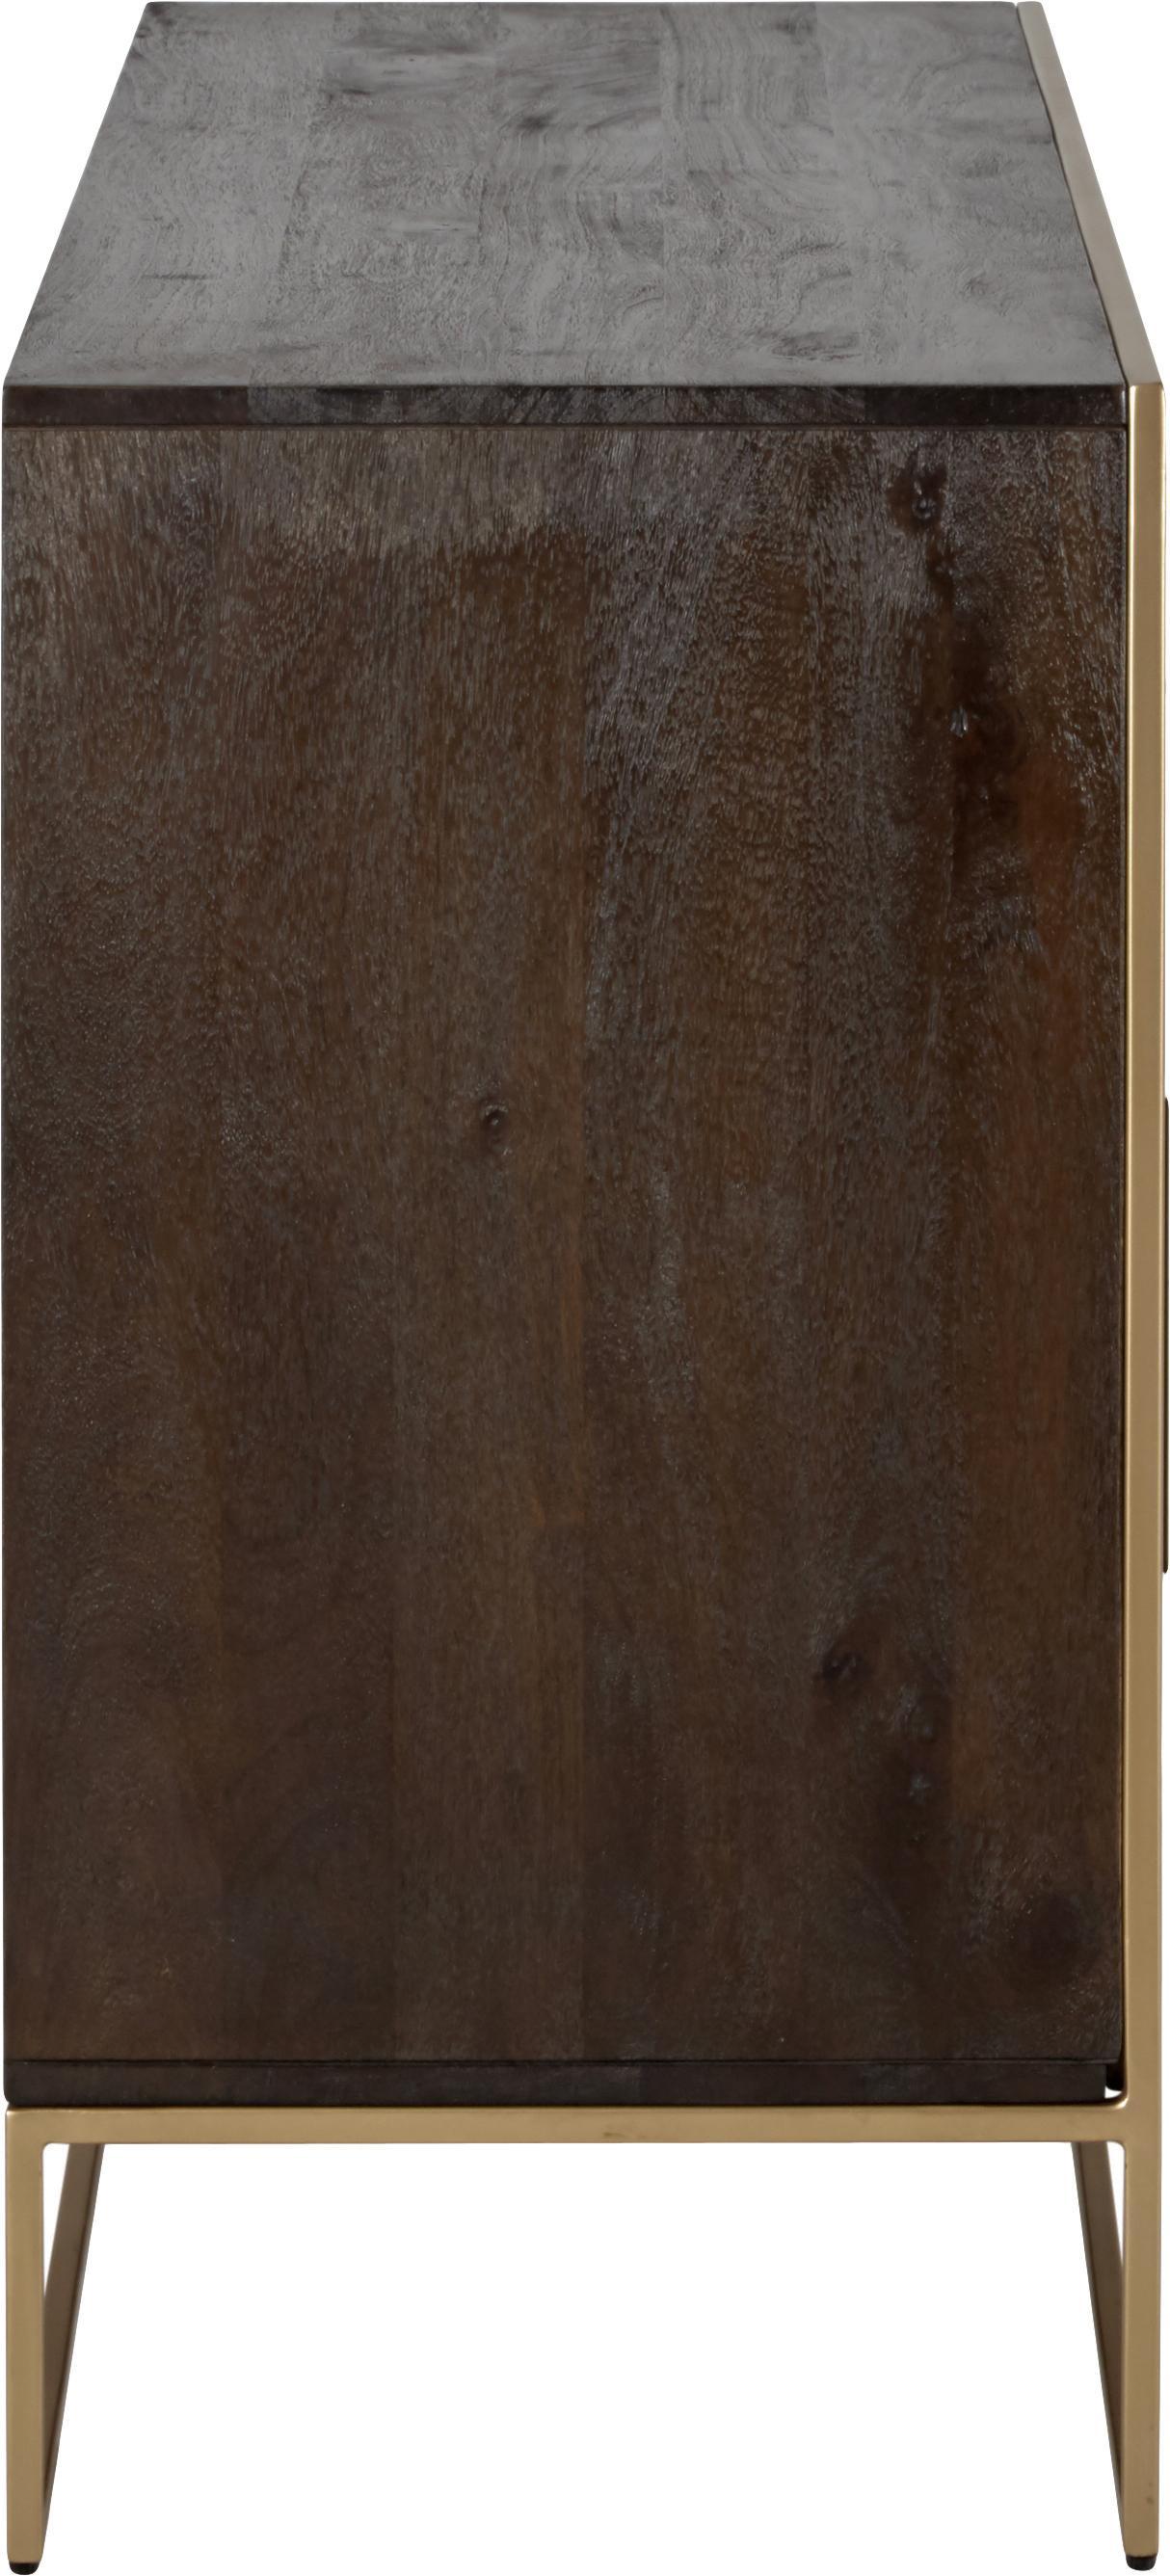 Sideboard Harry aus Massivholz, Korpus: Massives Mangoholz, lacki, Griffe: Metall, pulverbeschichtet, Gestell: Metall, pulverbeschichtet, Mangoholz, Goldfarben, 175 x 85 cm